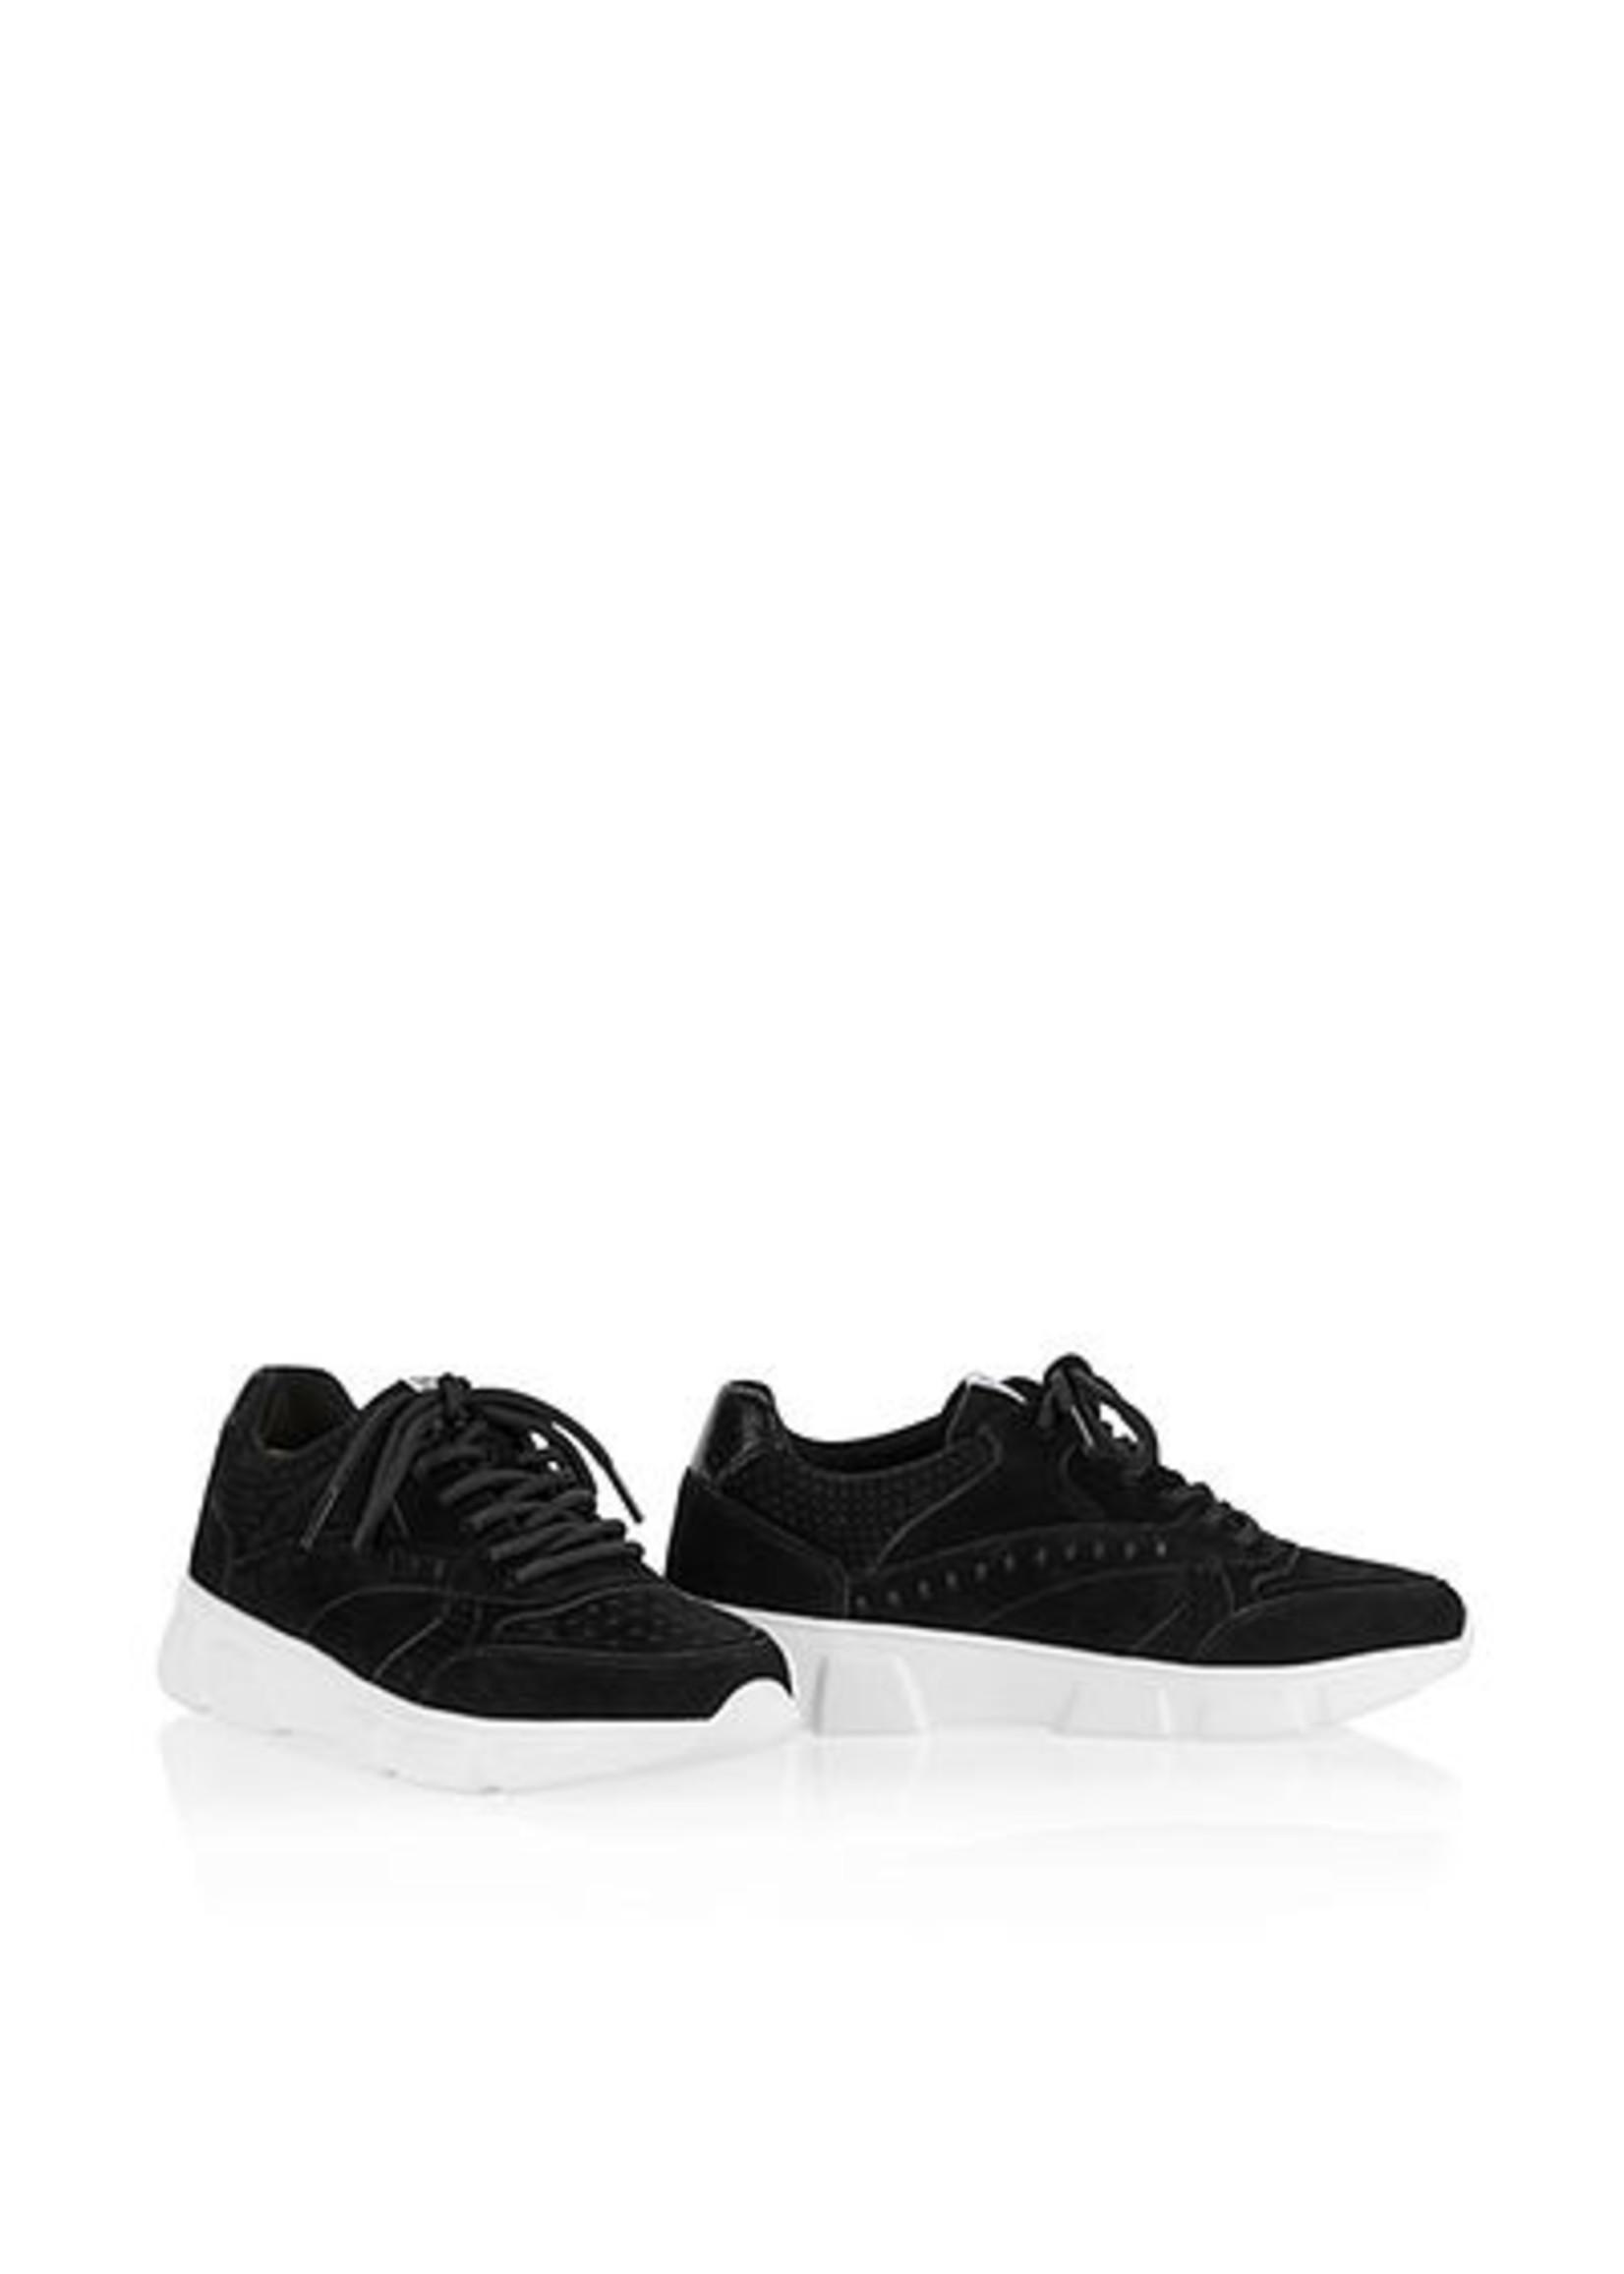 Marccain Bags & Shoes Sneaker RB SH.02 L20 black